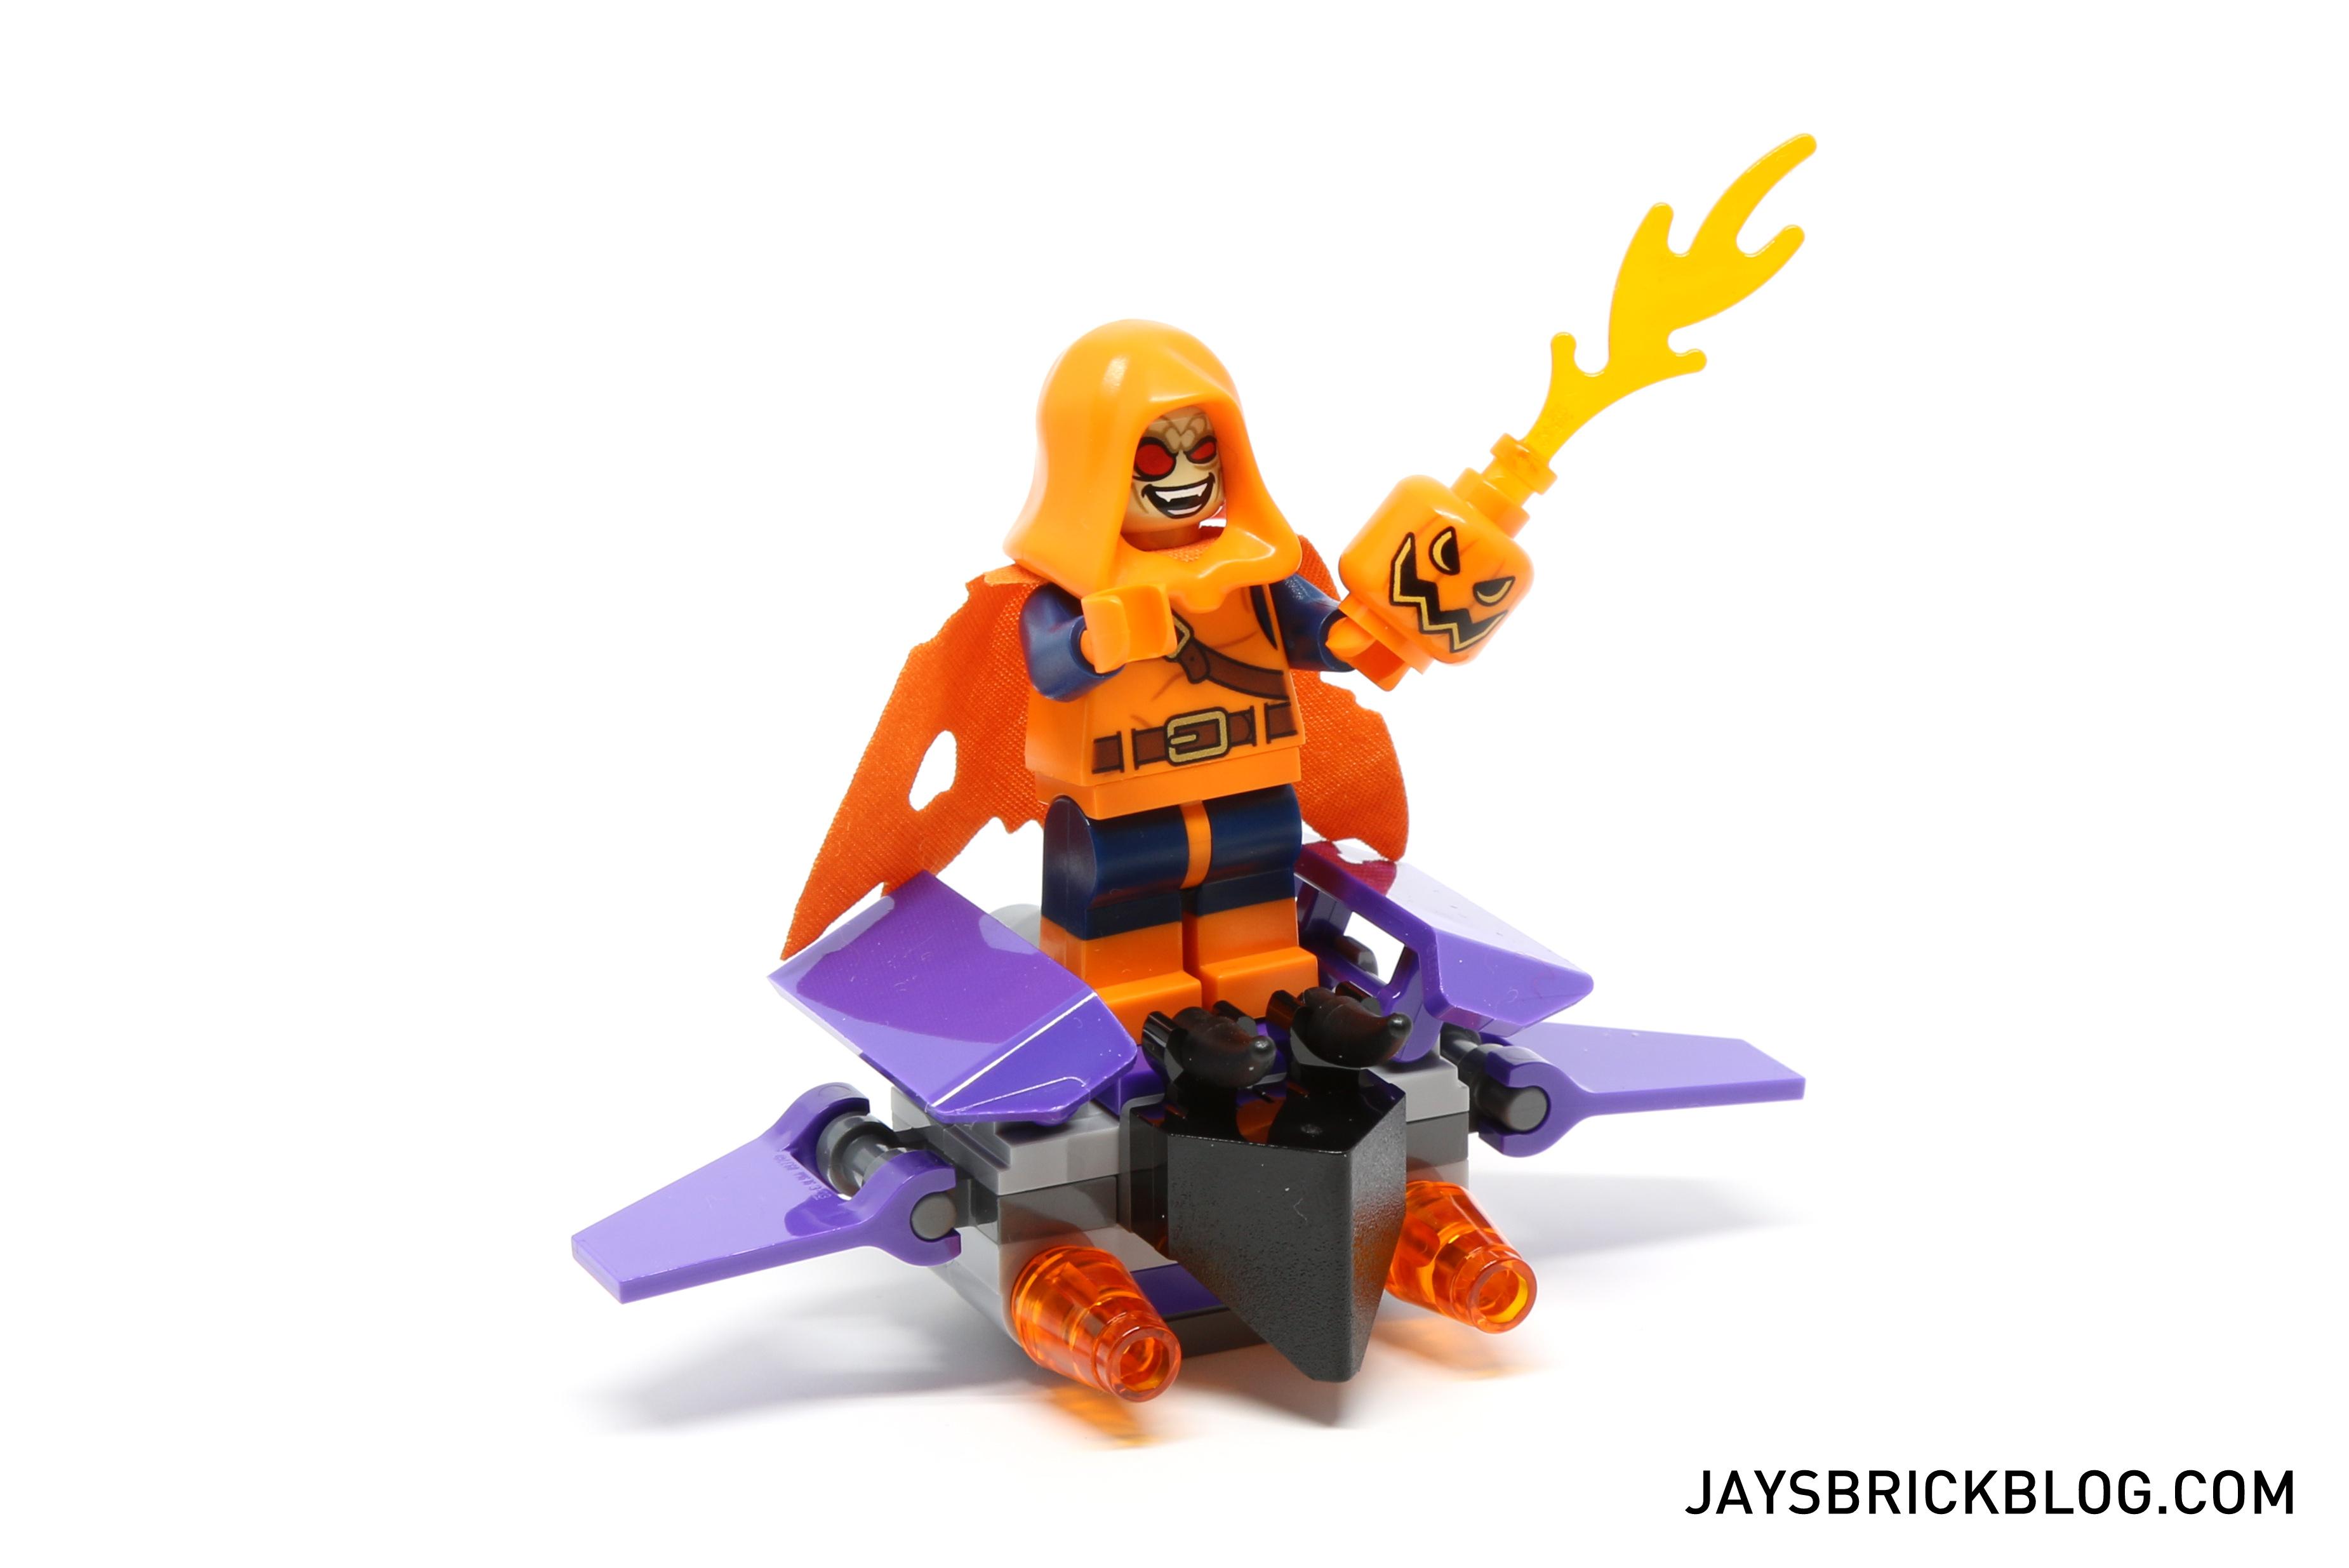 LEGO HOBGOBLIN MINIFIGURE SUPER HEROES FIG AUTHENTIC